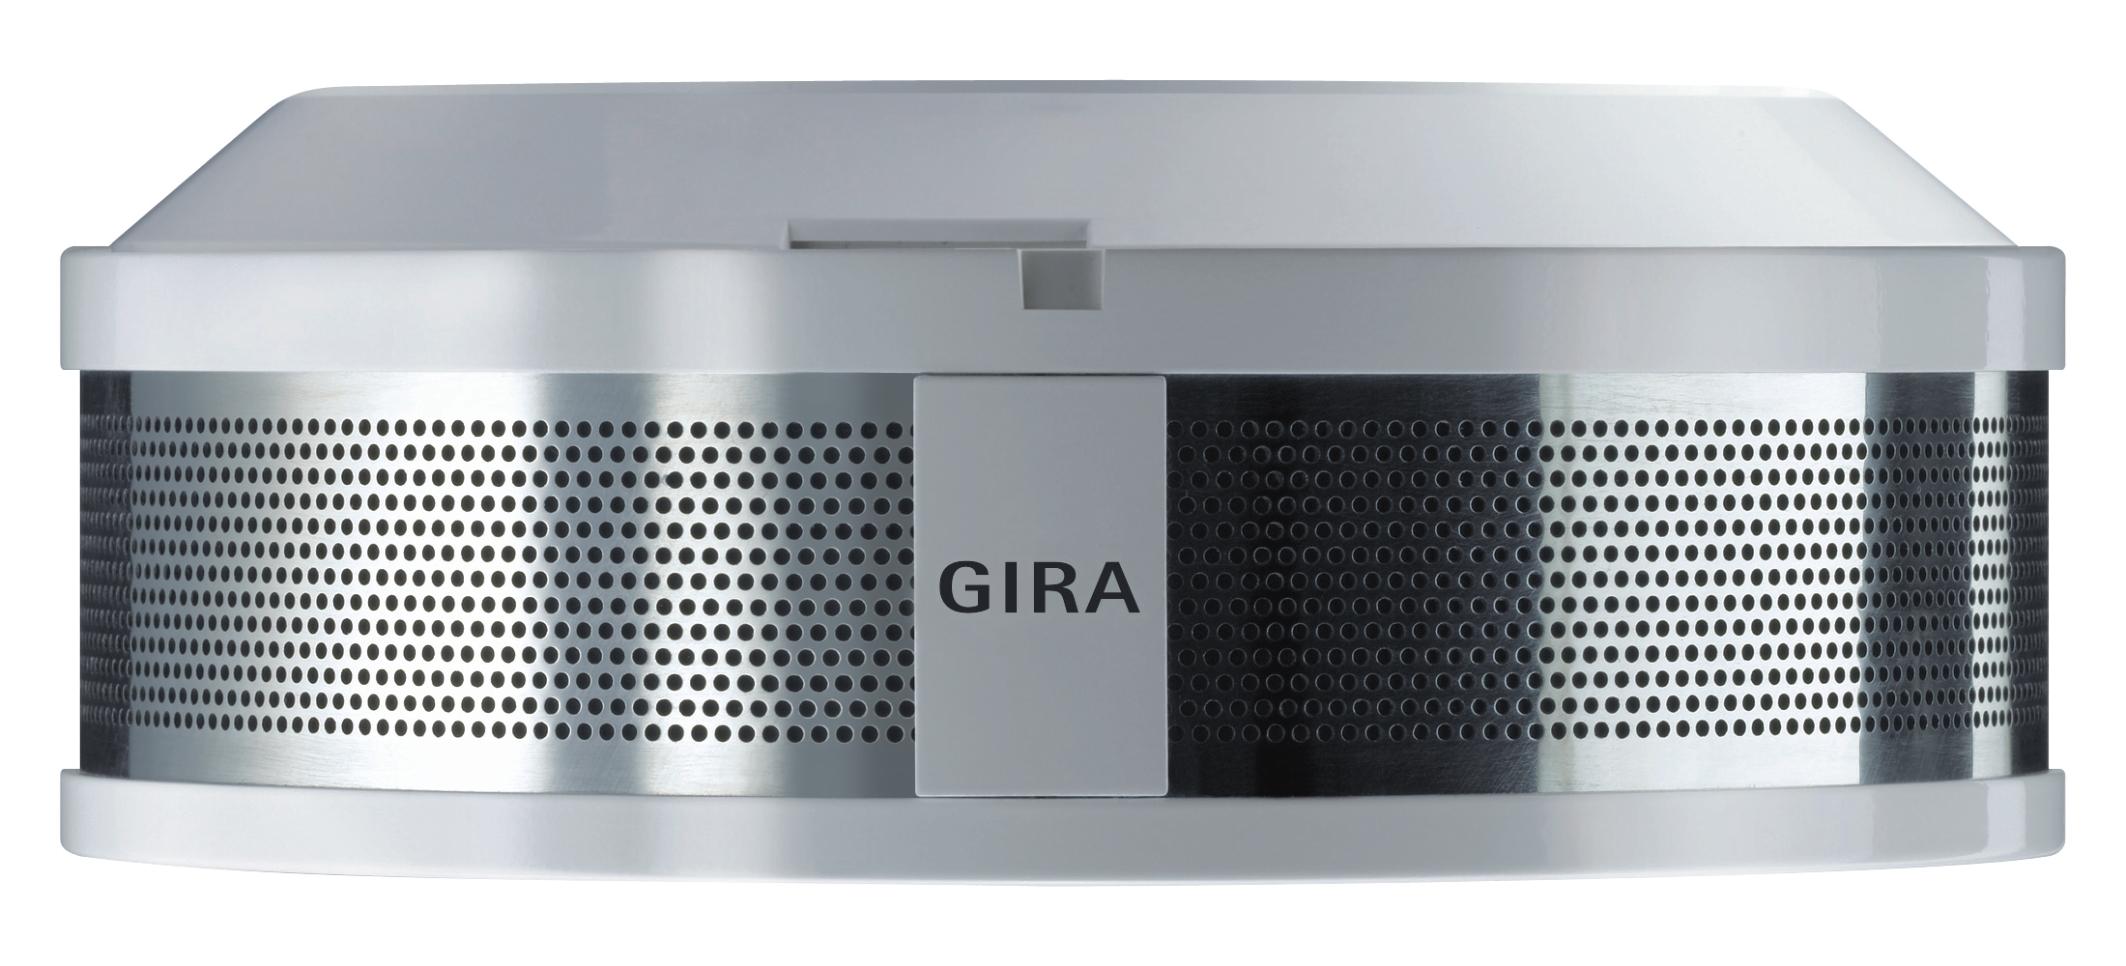 rauchmelder vernetzen echt connected smarthome. Black Bedroom Furniture Sets. Home Design Ideas